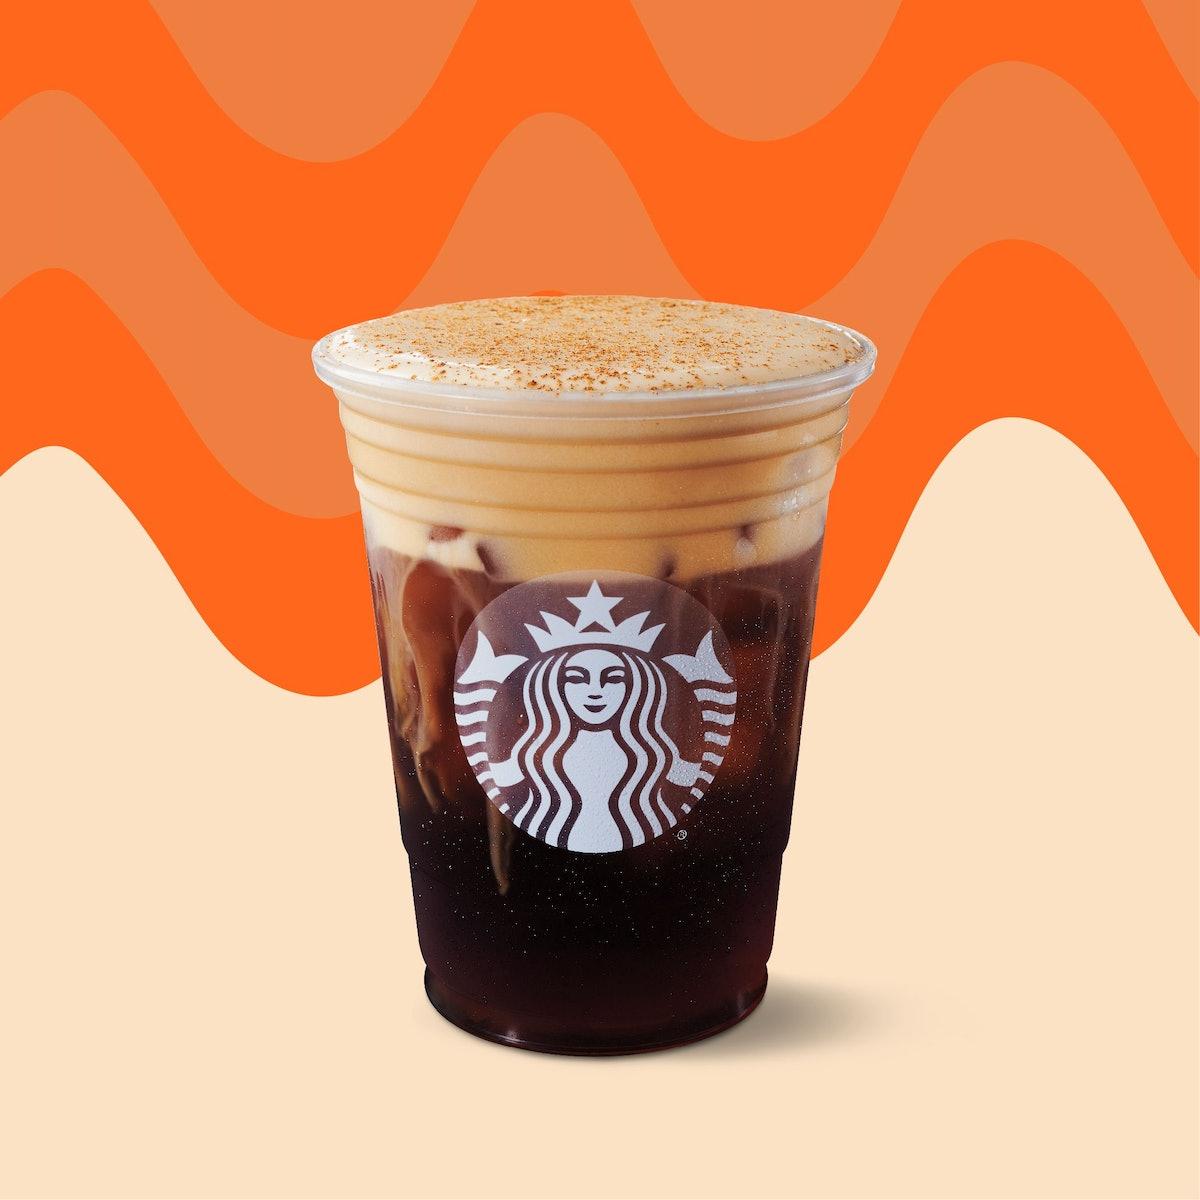 Starbucks' Pumpkin Cream Cold Brew is coming back so soon.